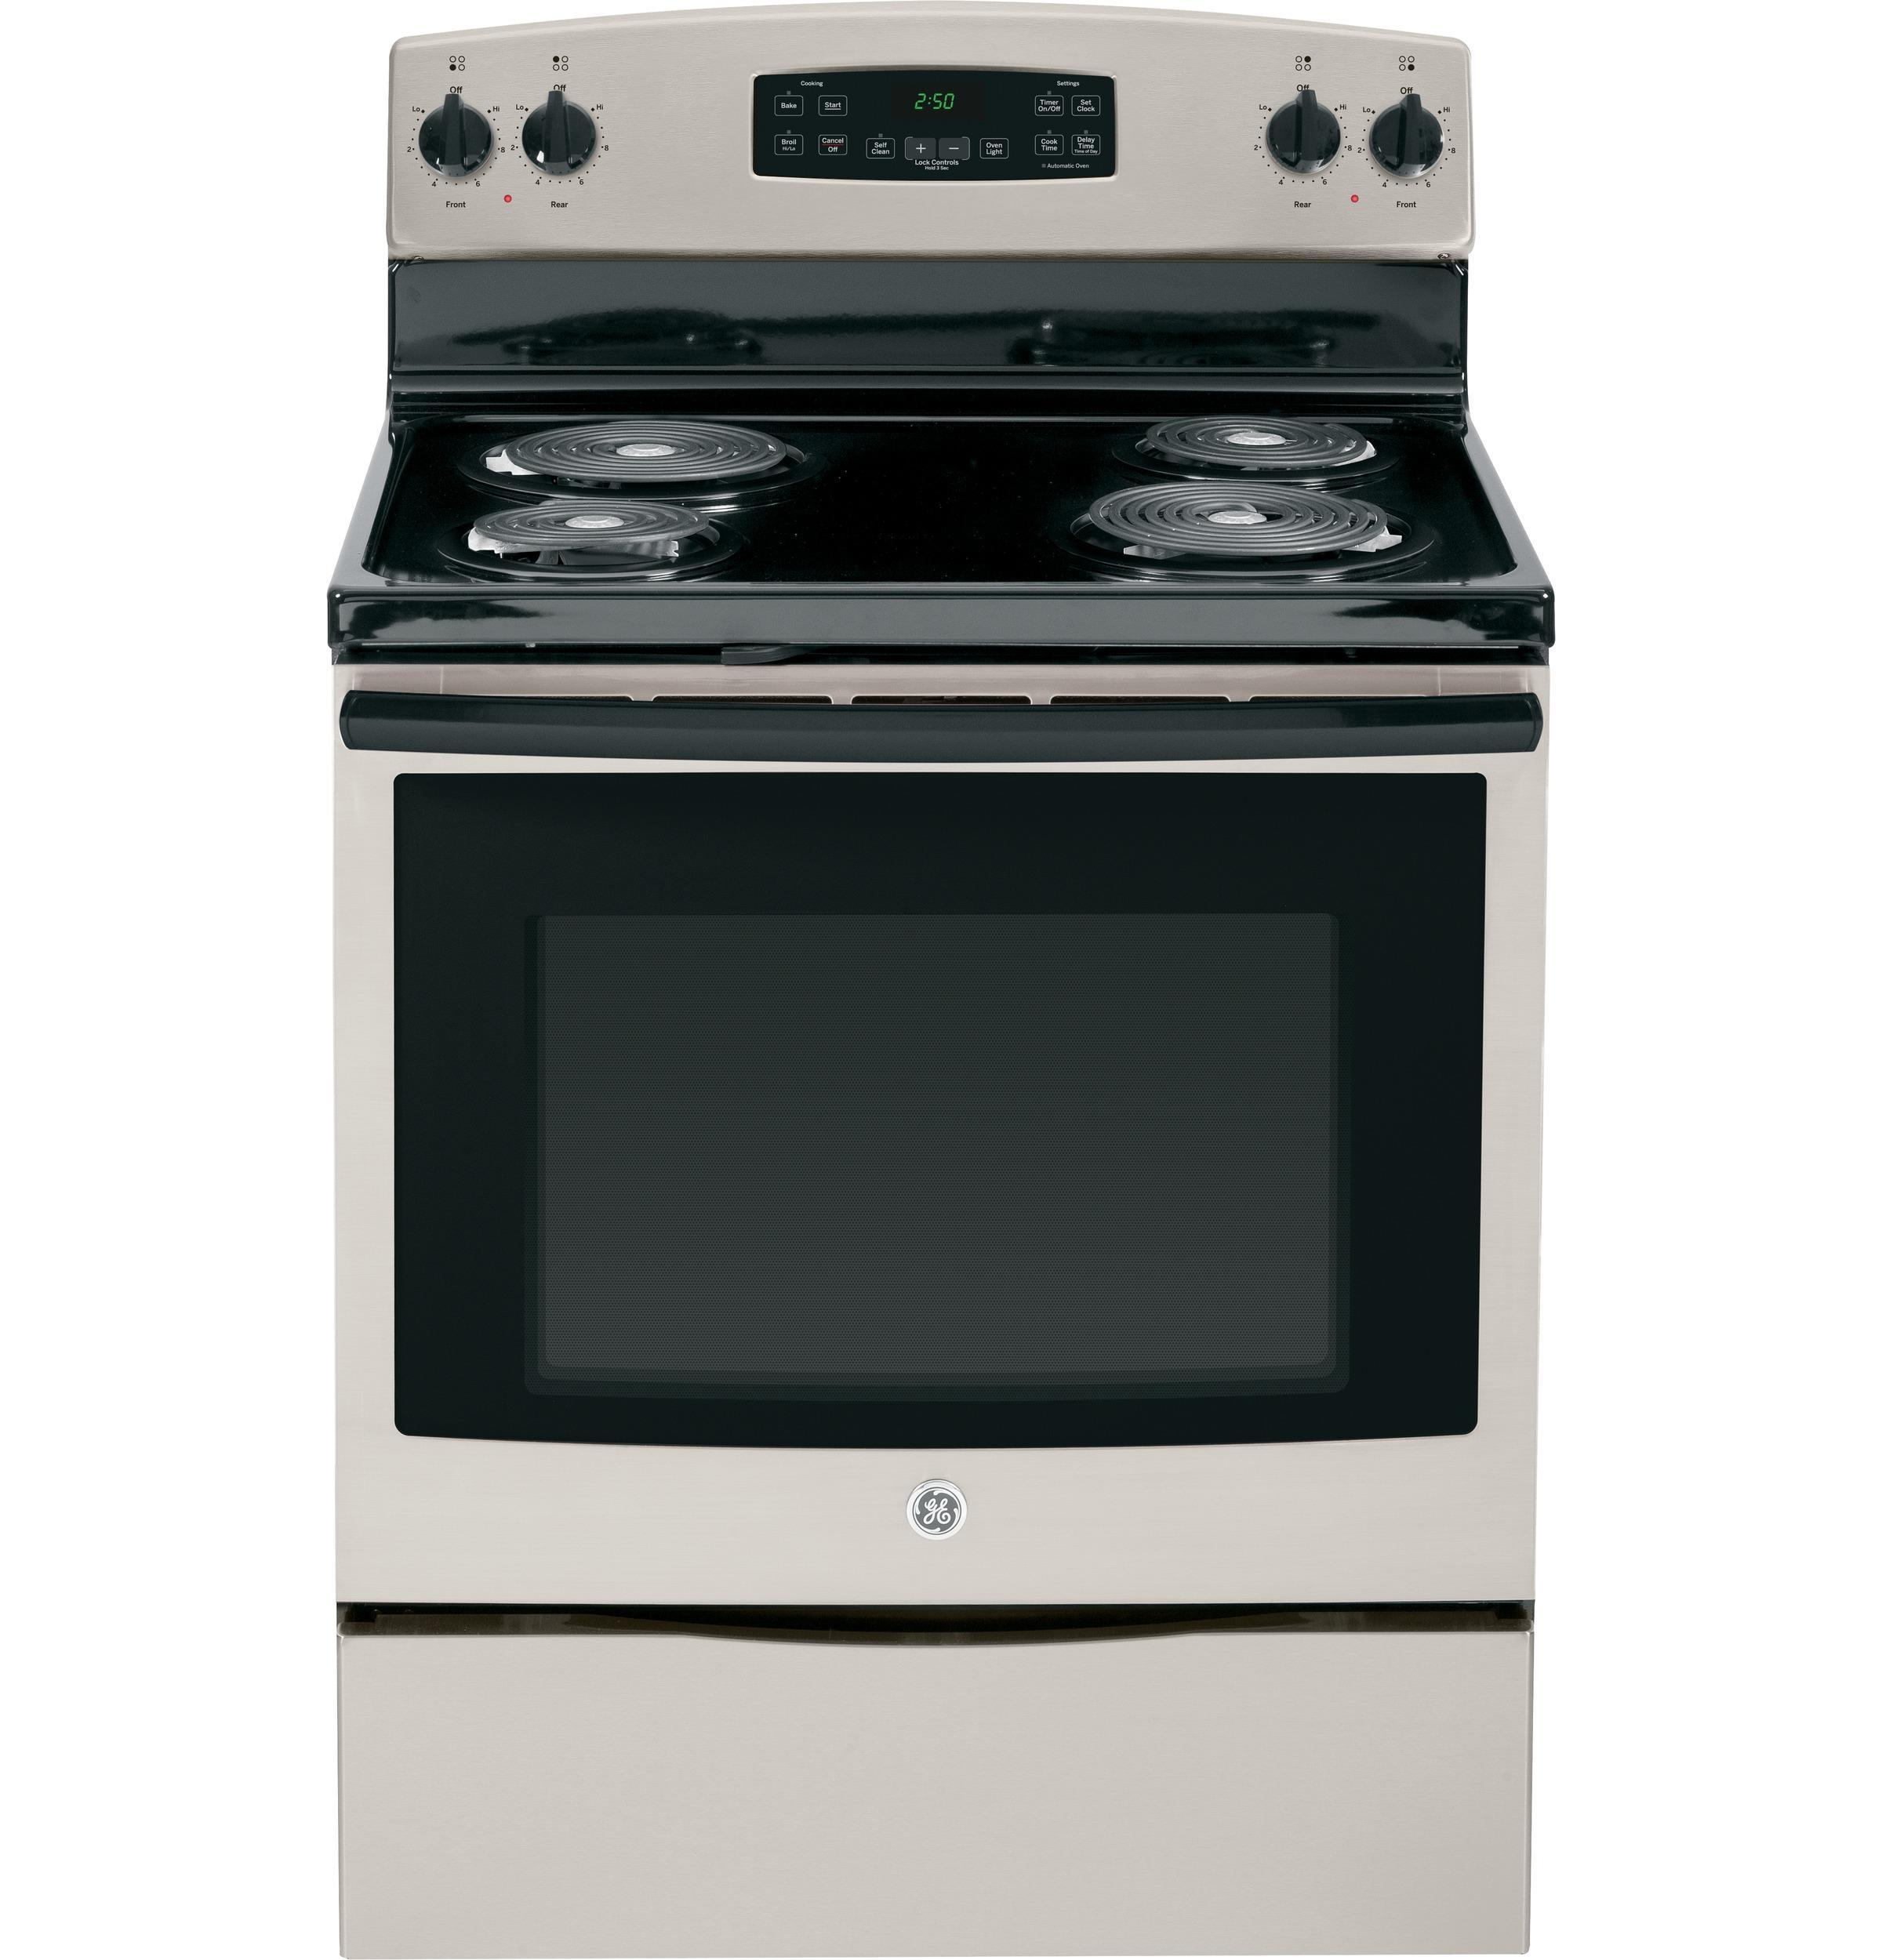 "GE Appliances Electric Range 30"" Free-Standing Electric Range - Item Number: JB250GFSA"